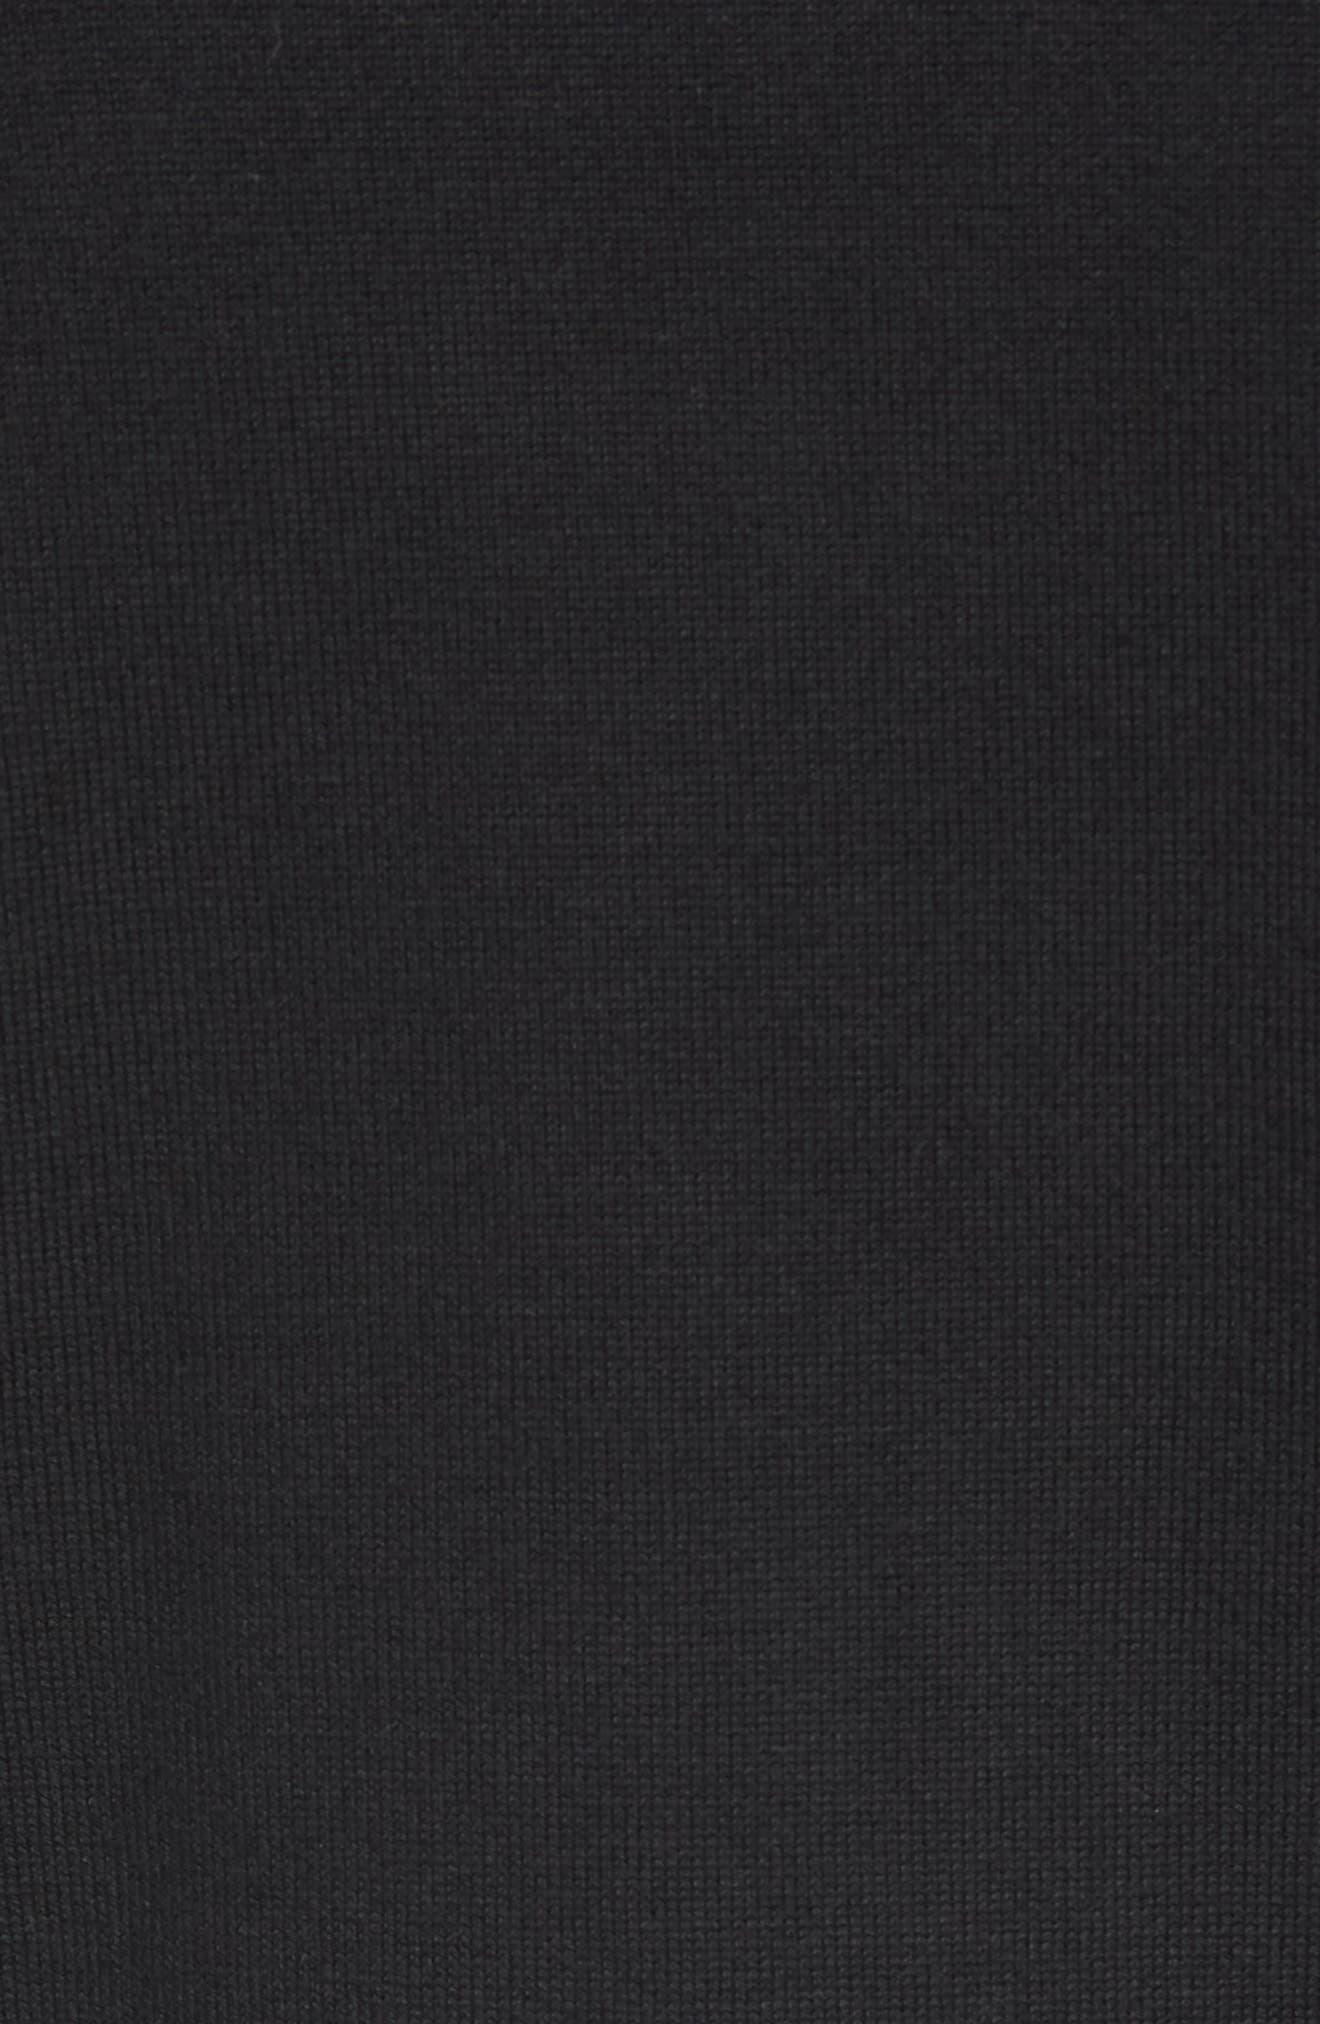 New York Jets - Lakemont Regular Fit Quarter Zip Sweater,                             Alternate thumbnail 5, color,                             BLACK